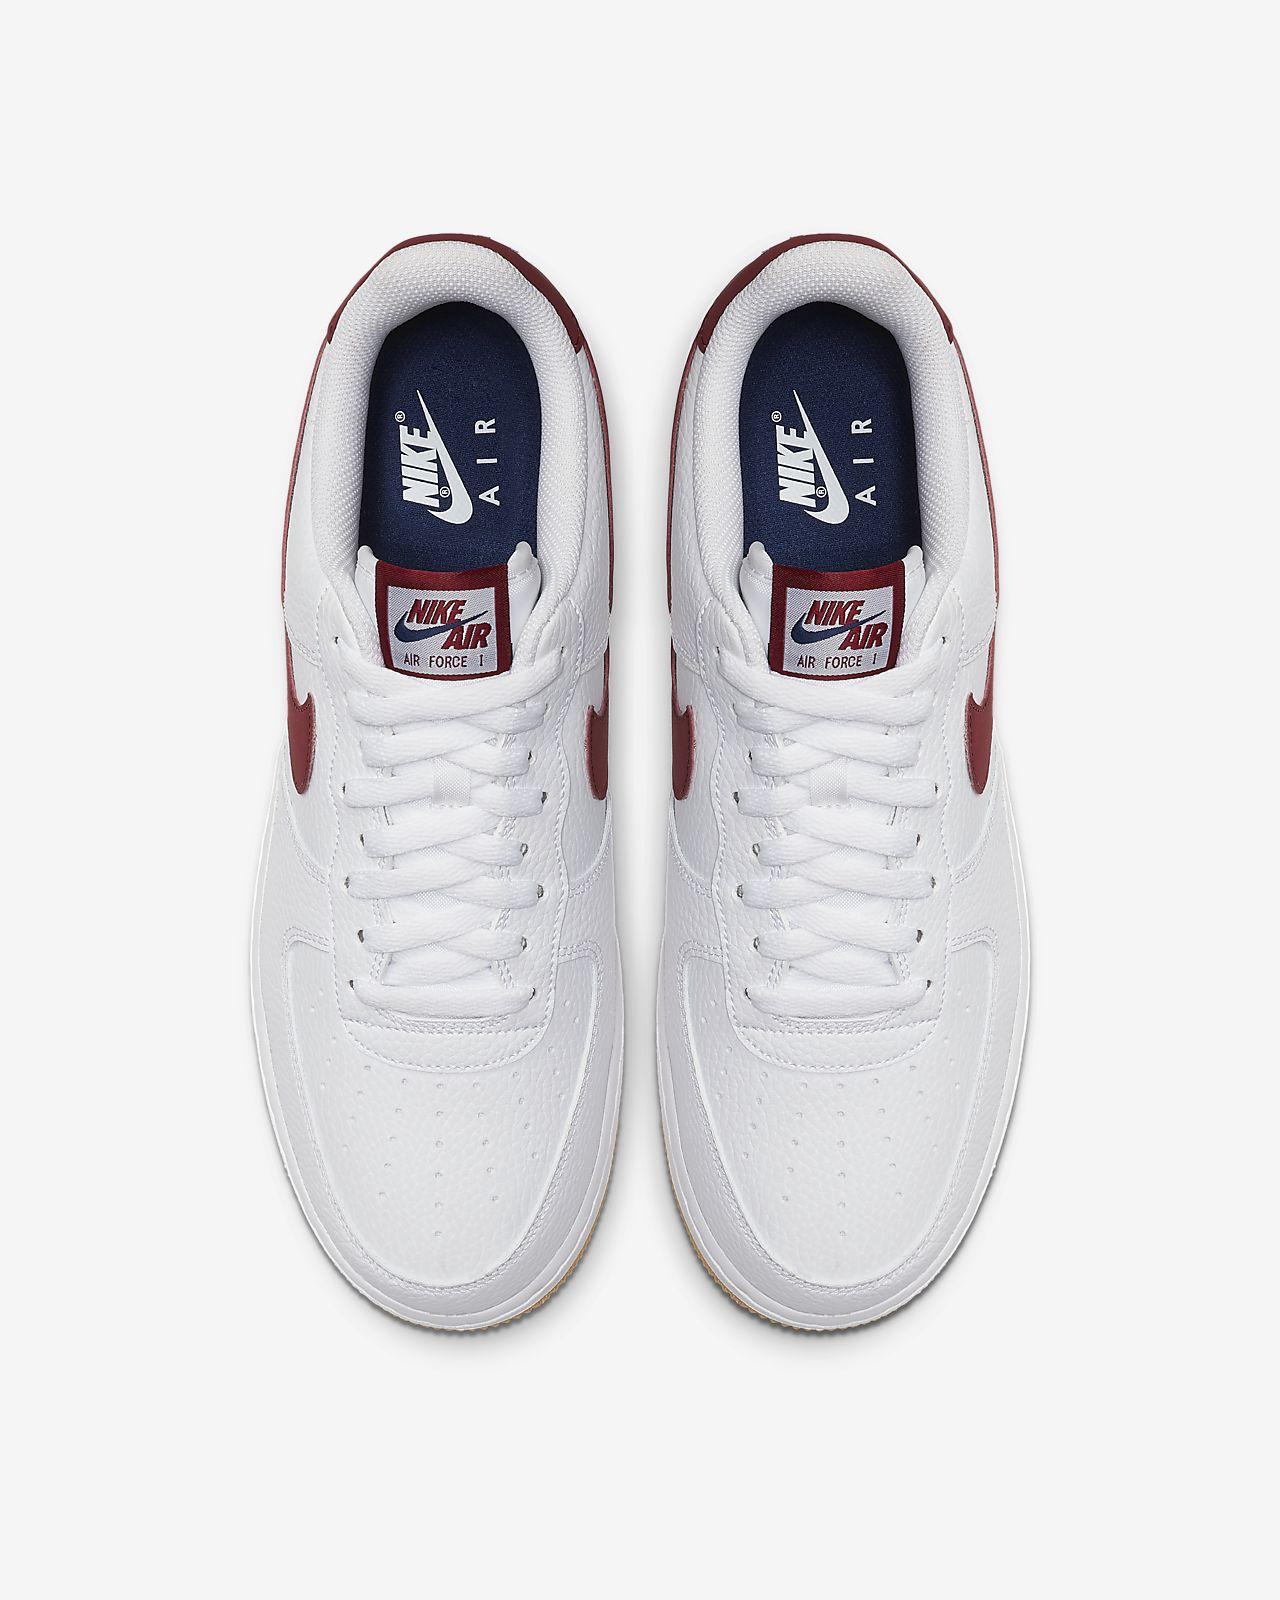 Gemütlich Nike Air Force 1 07 Low Weiß Weiß Blau : Nike Air